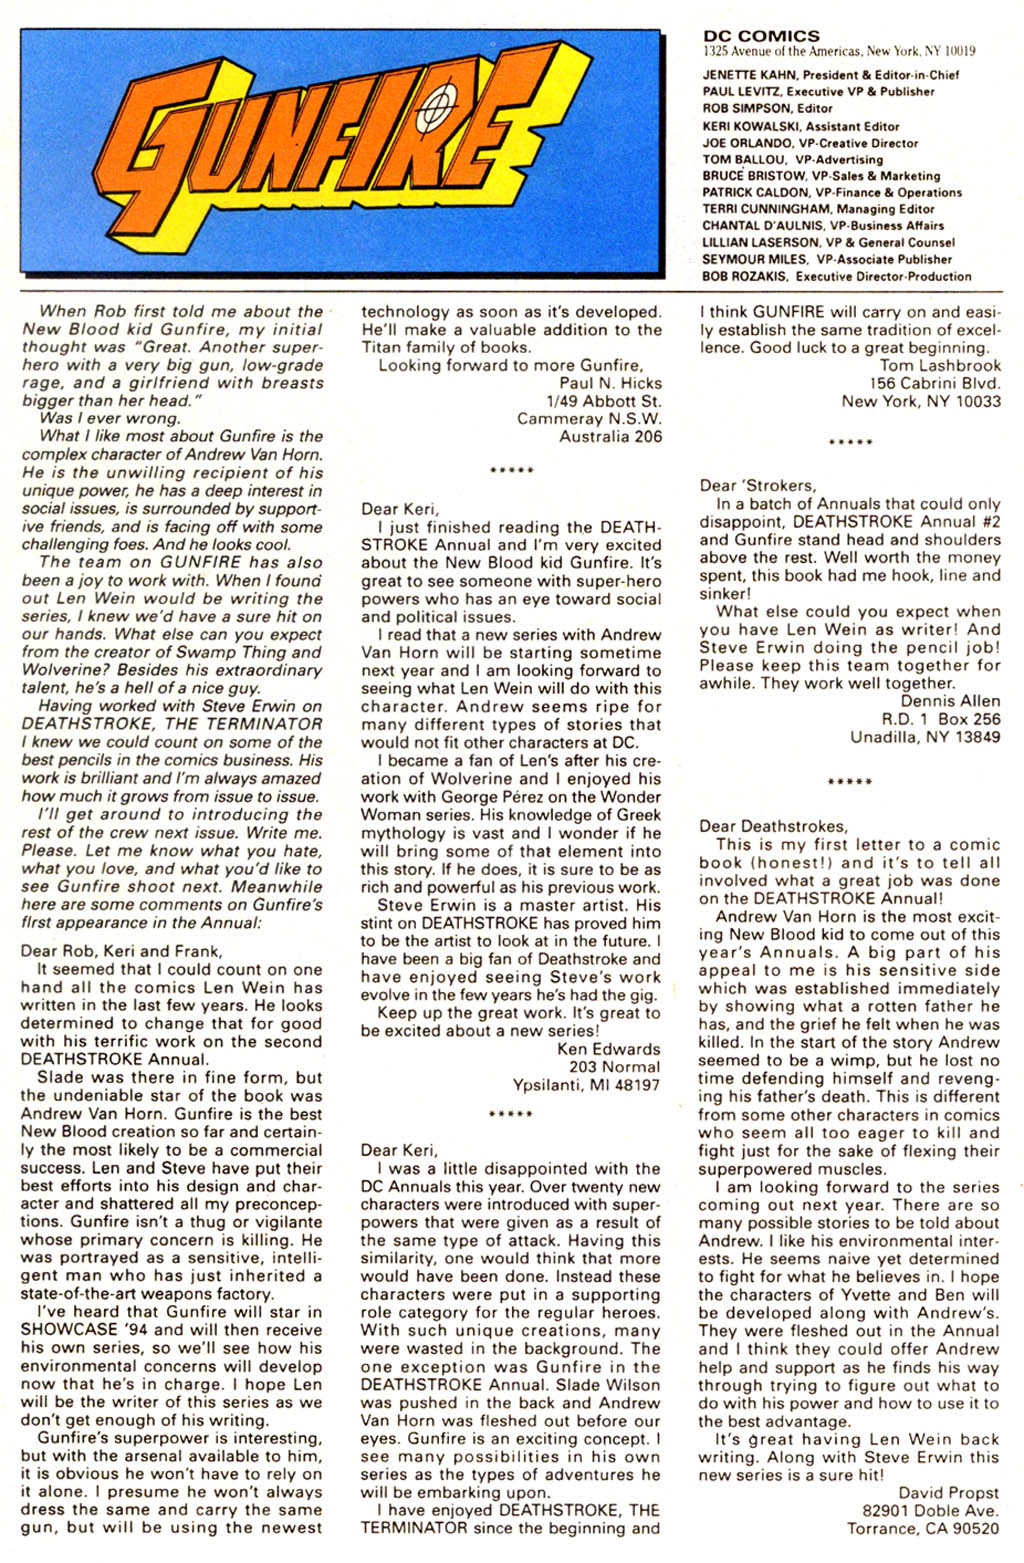 Read online Gunfire comic -  Issue #1 - 32